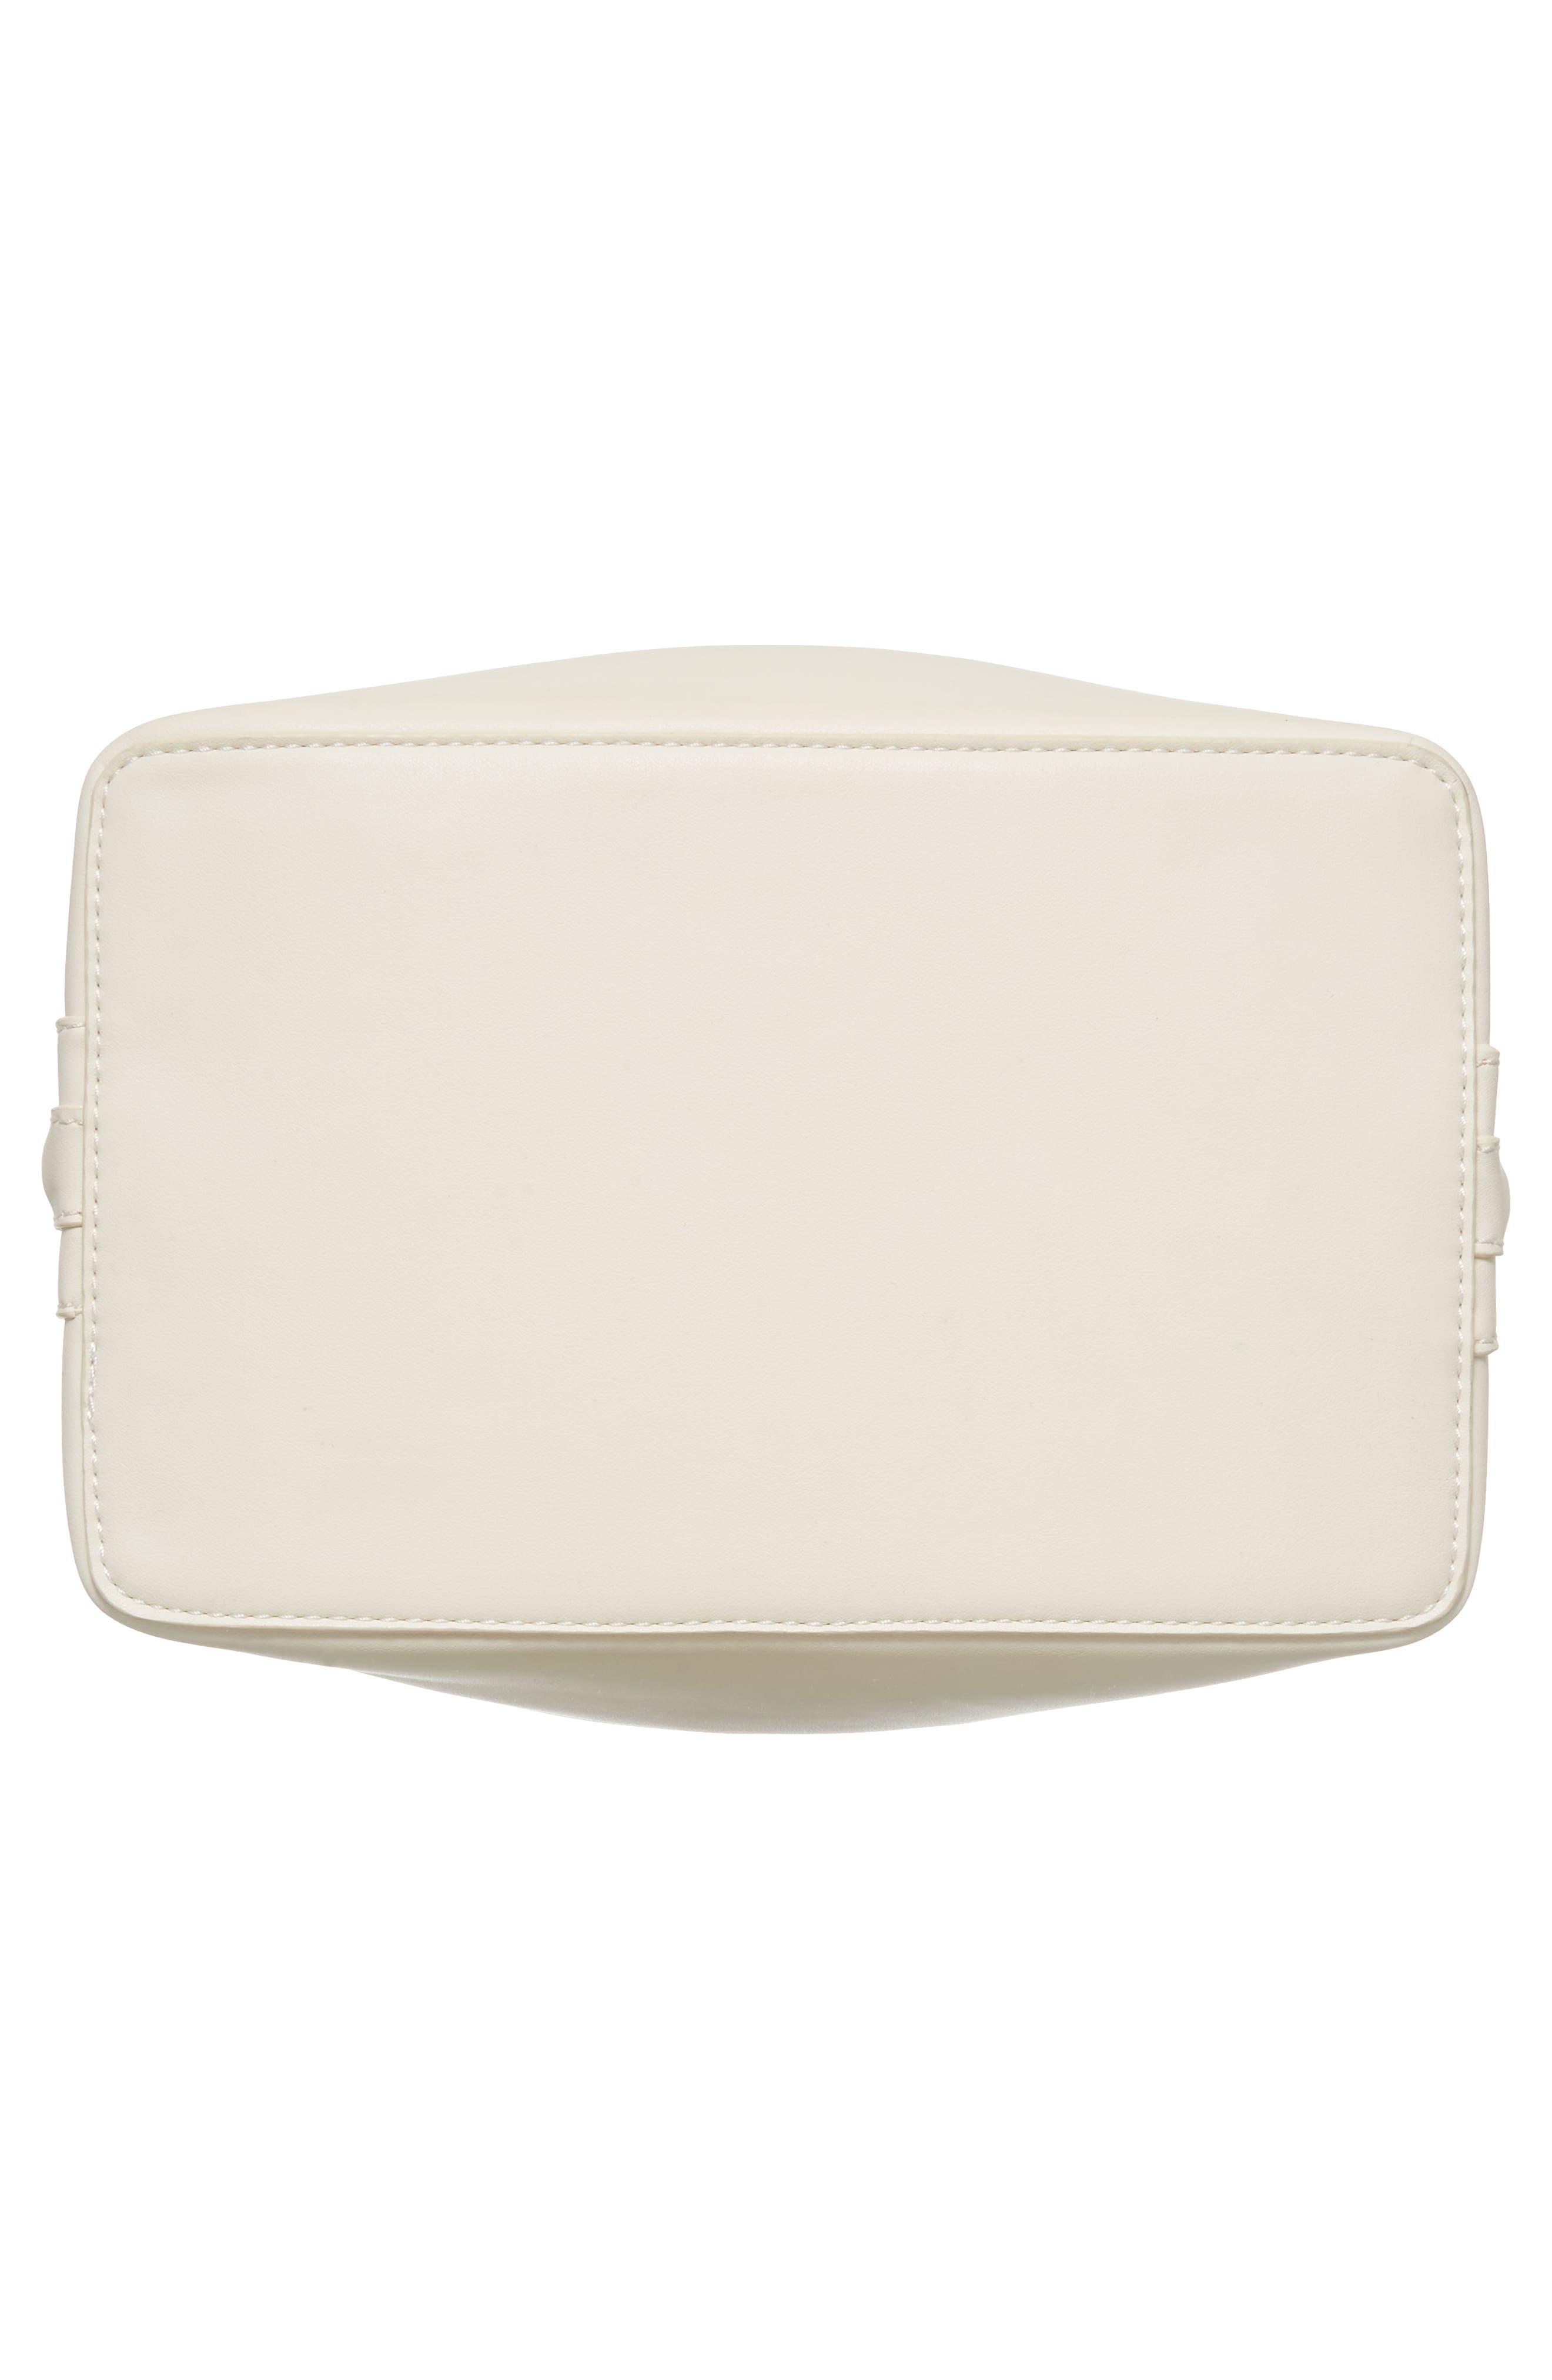 Faux Leather Bucket Tote,                             Alternate thumbnail 6, color,                             White/ Blush